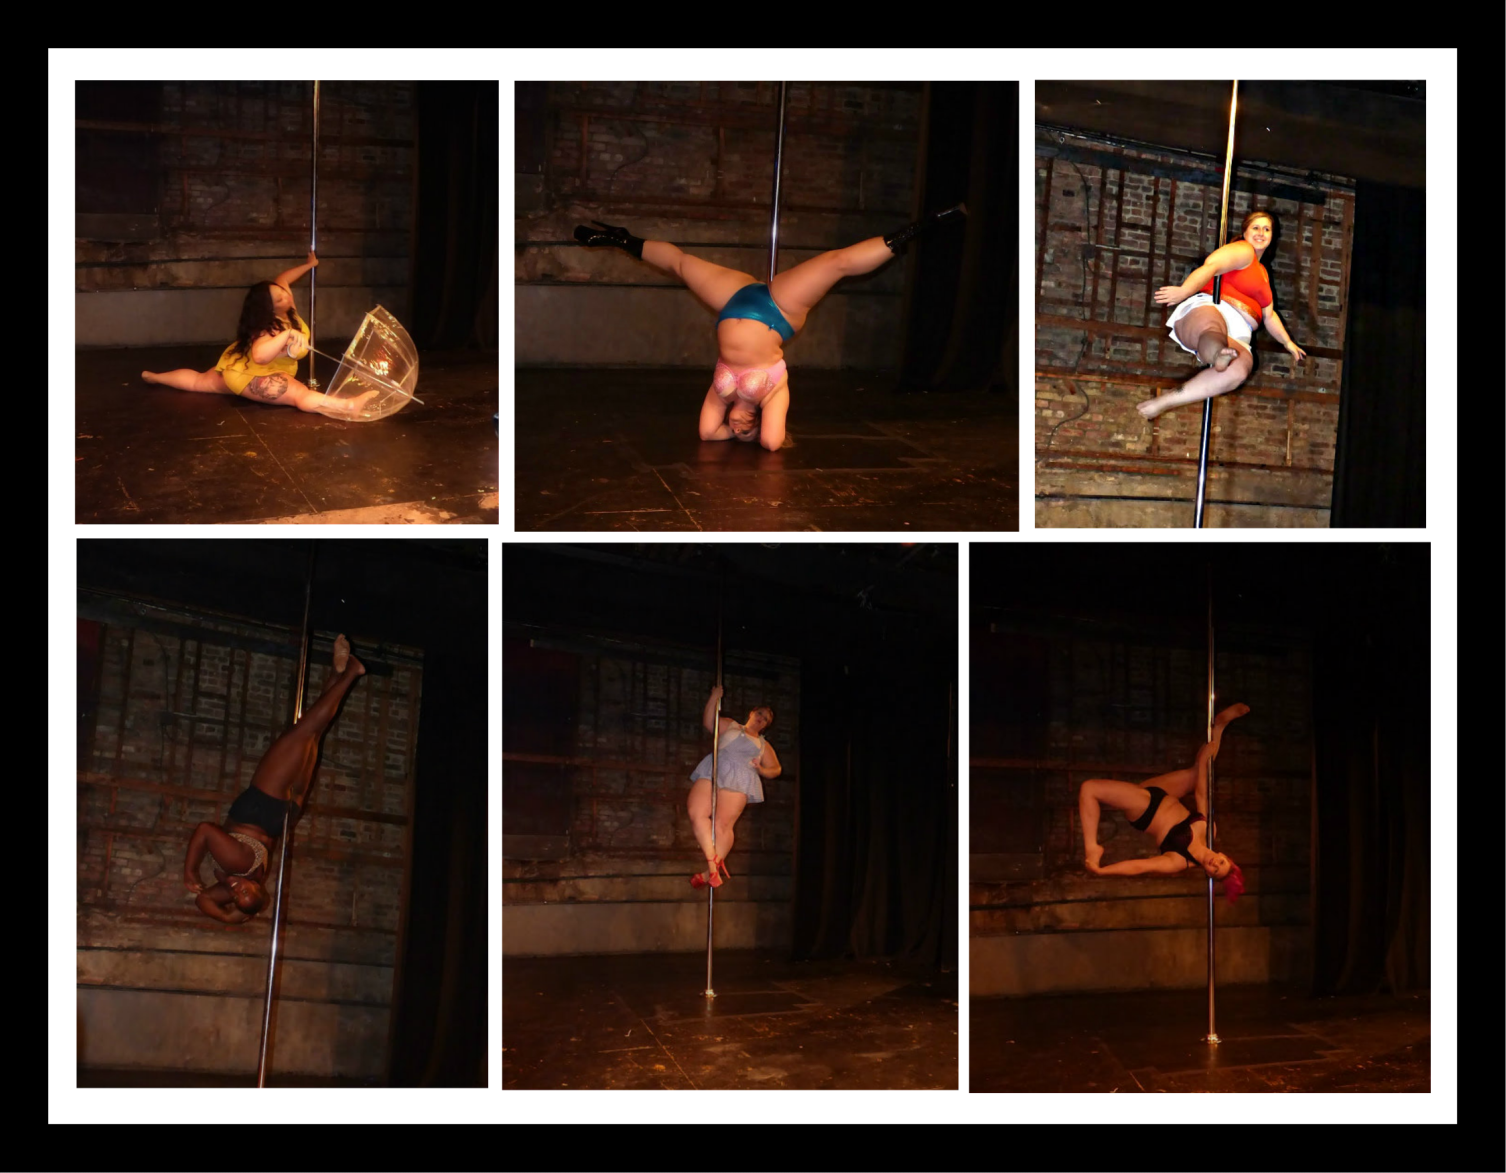 Dangerous Curves Recap: Pole Dancing, Curvy Women & Good Times!